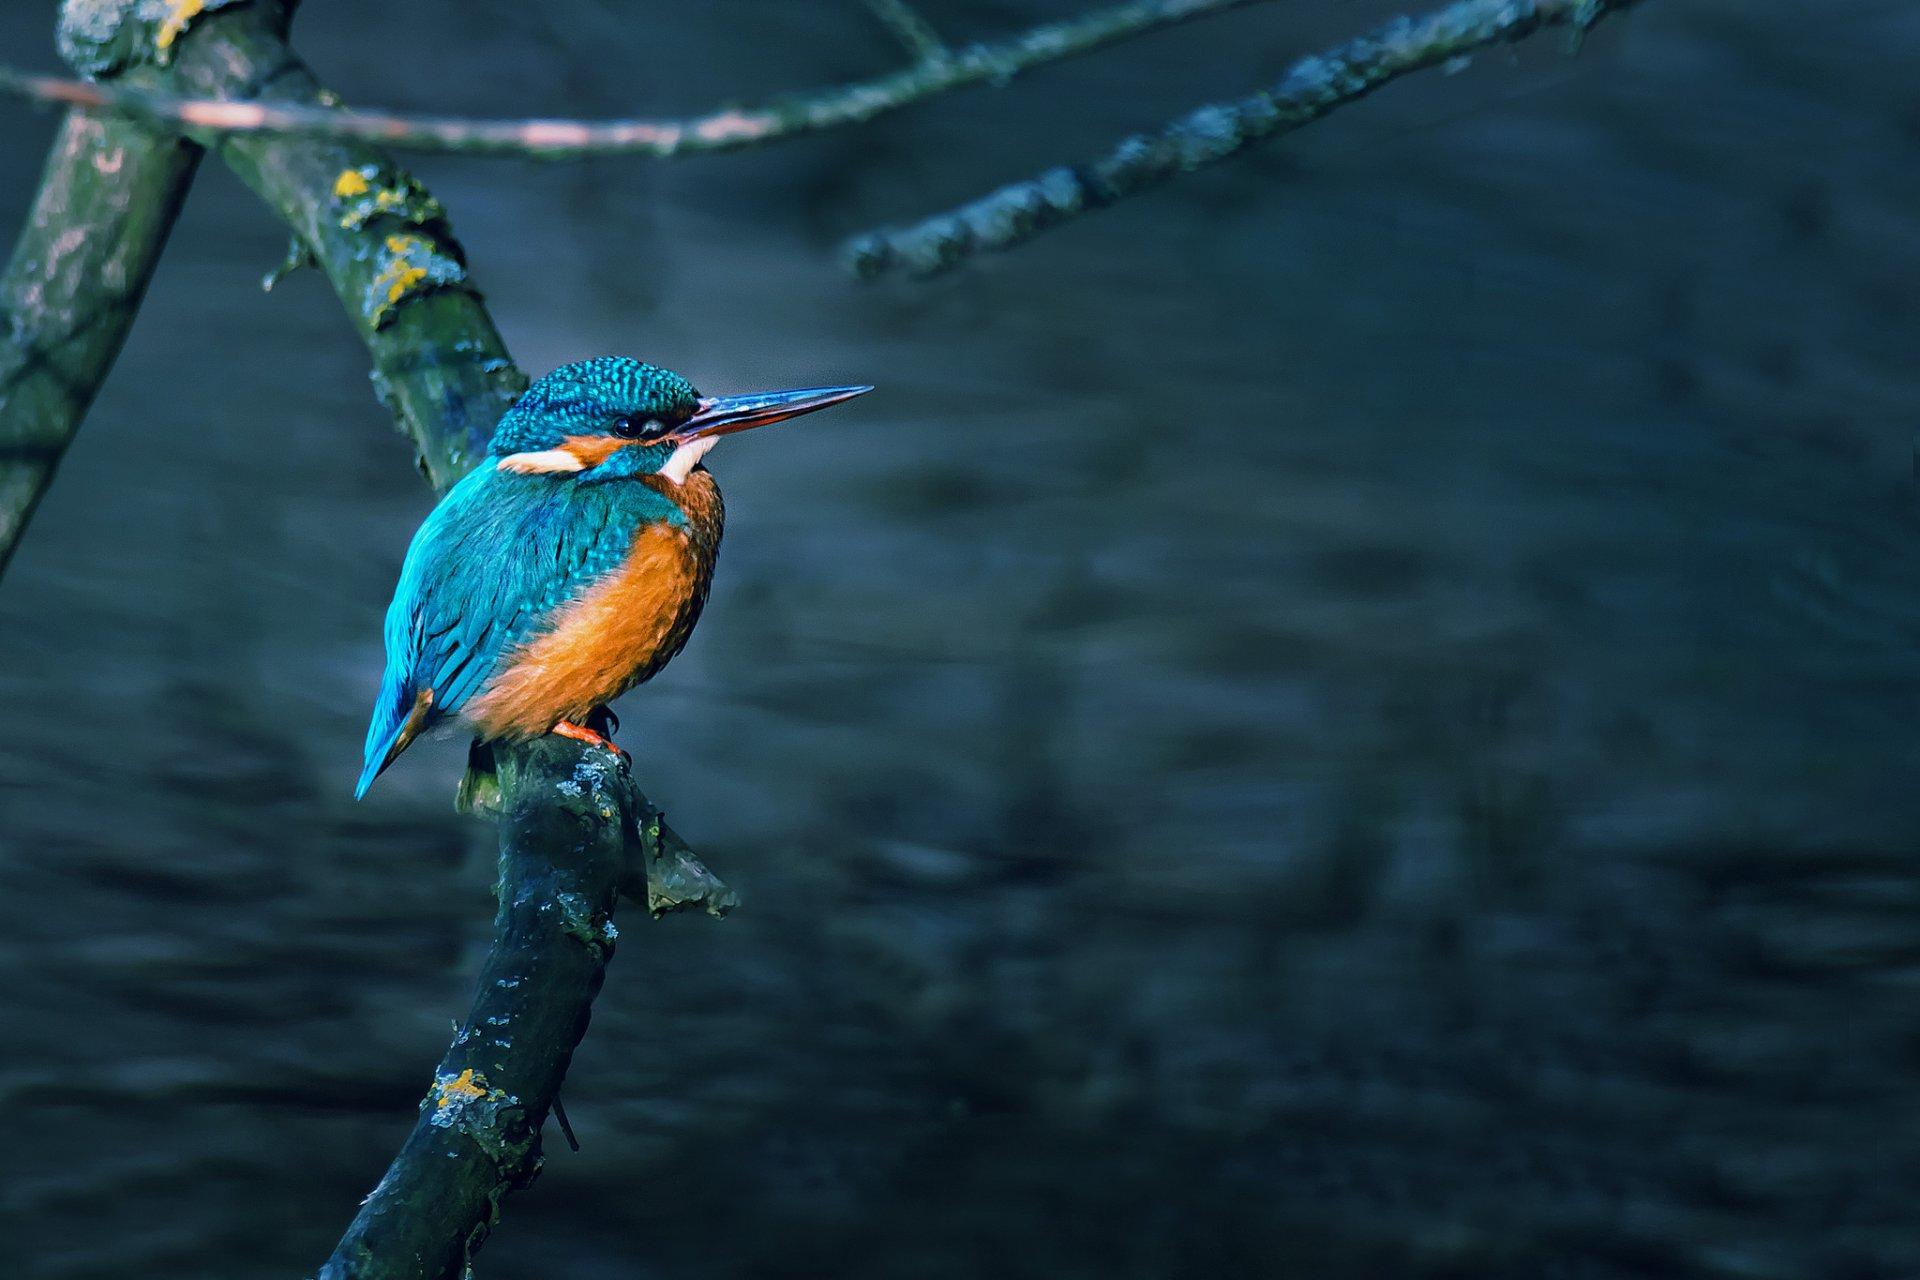 Kingfisher bird wallpaper